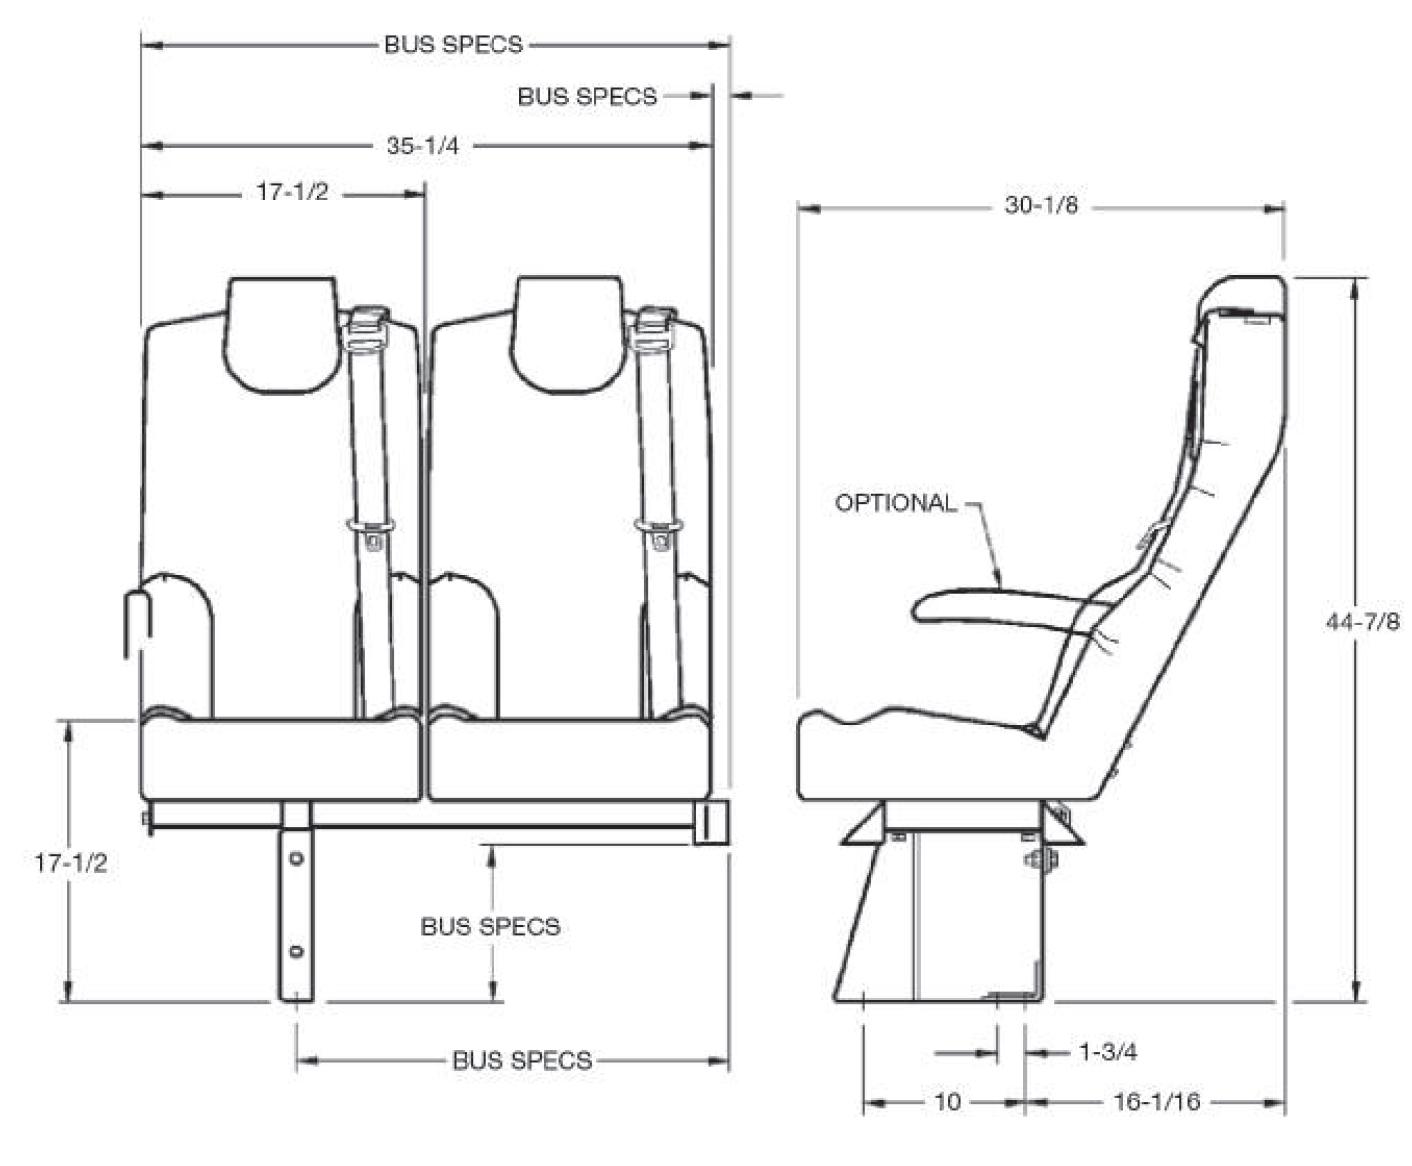 Esquire Seat Passenger Bus Seating Freedman Seating